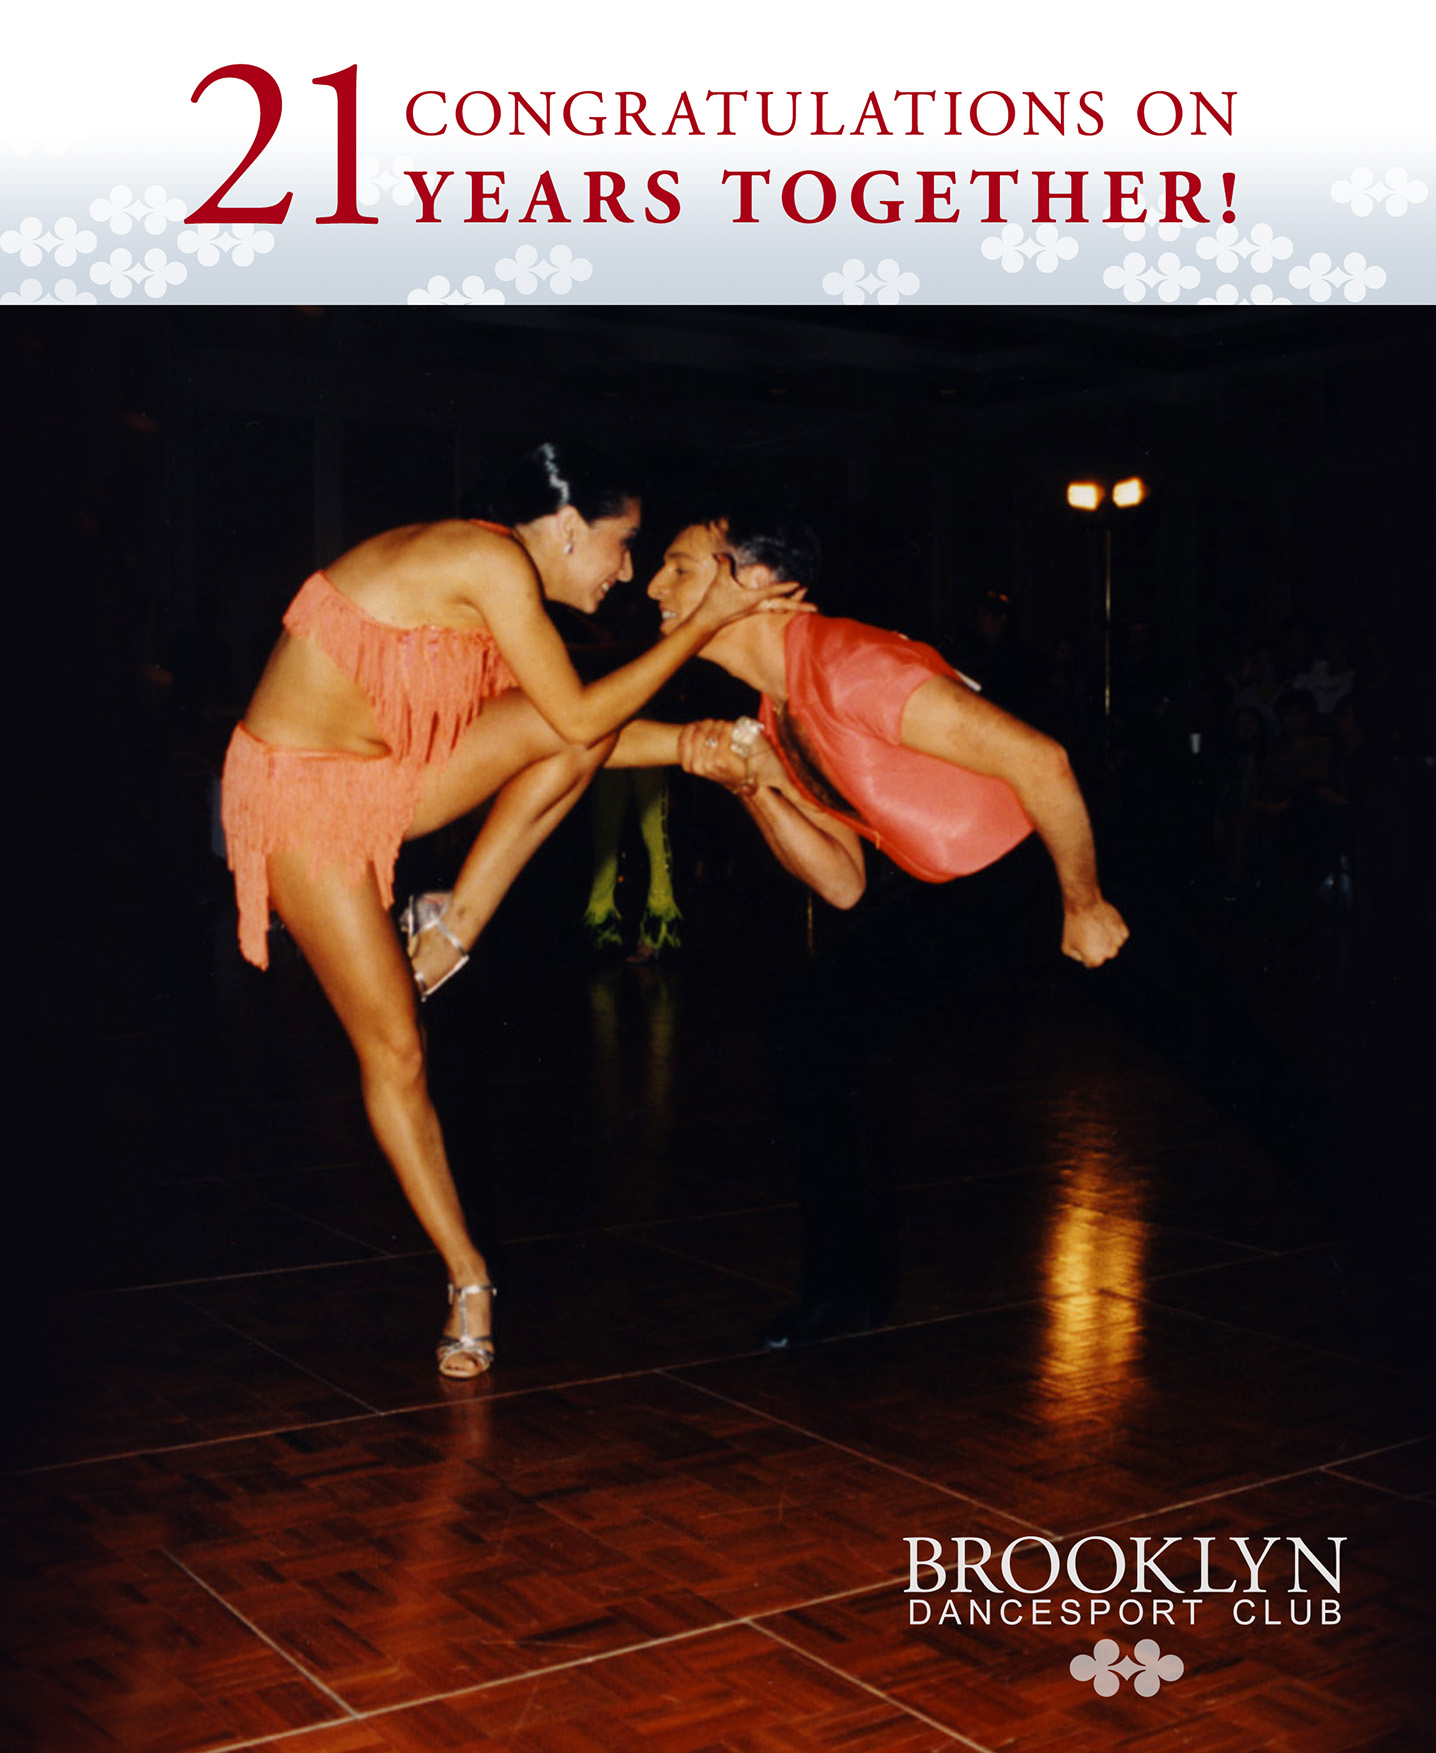 Eugene Katsevman and Maria Manusova's Anniversary